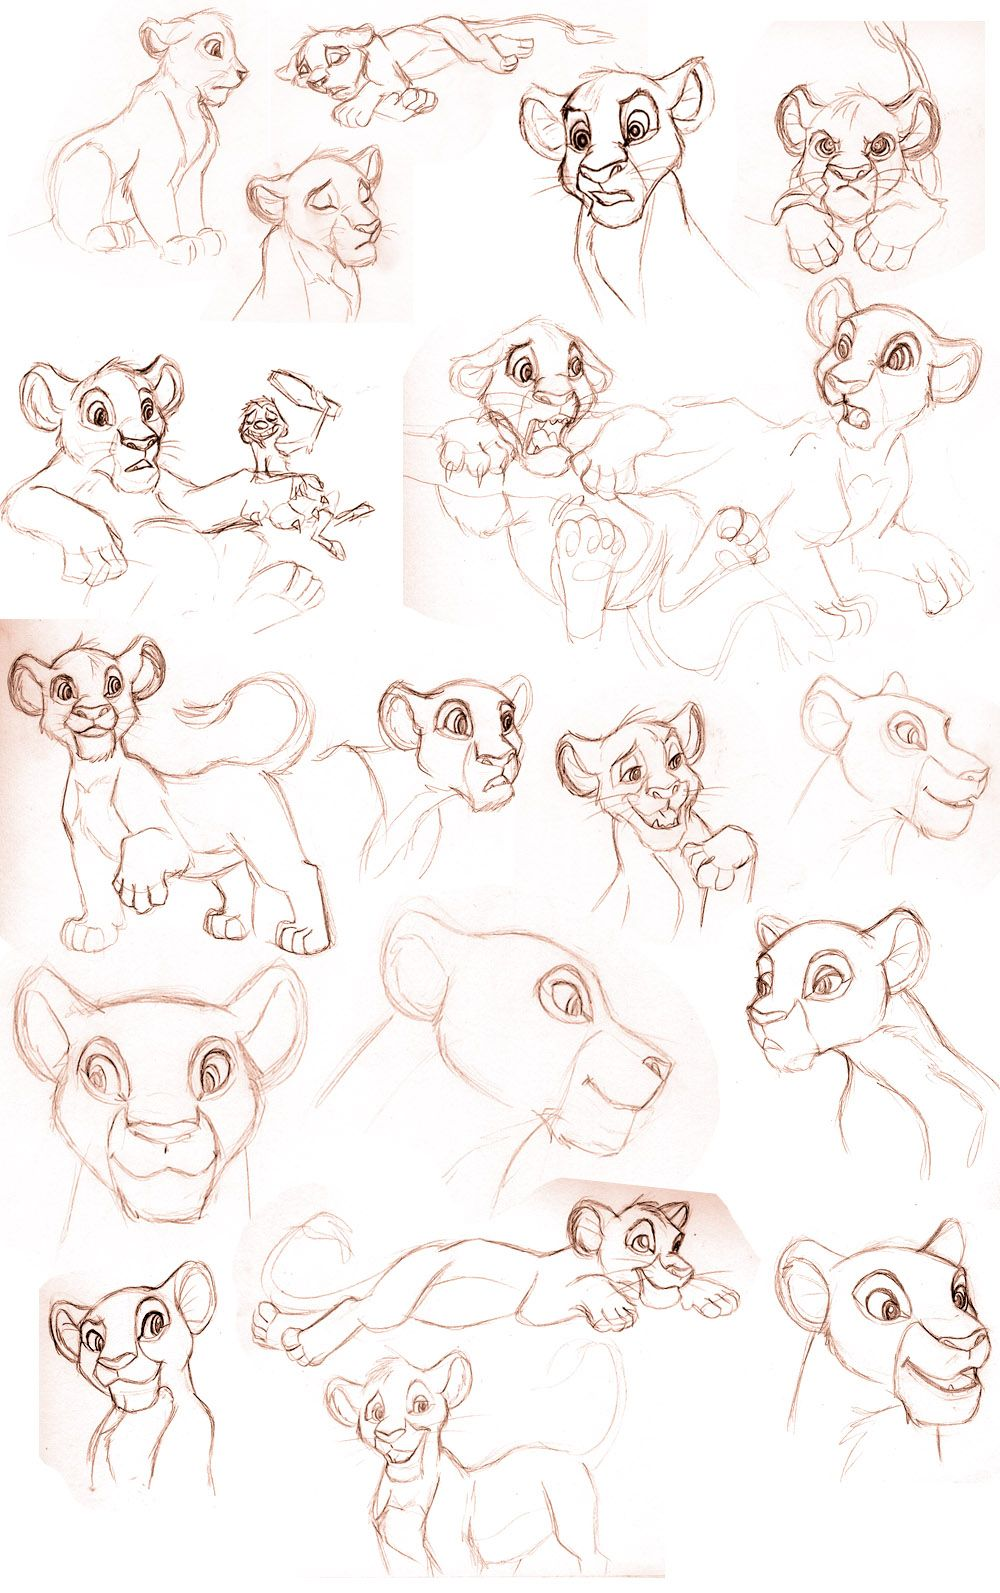 animation sketch illustration disney lion king - Pesquisa Google